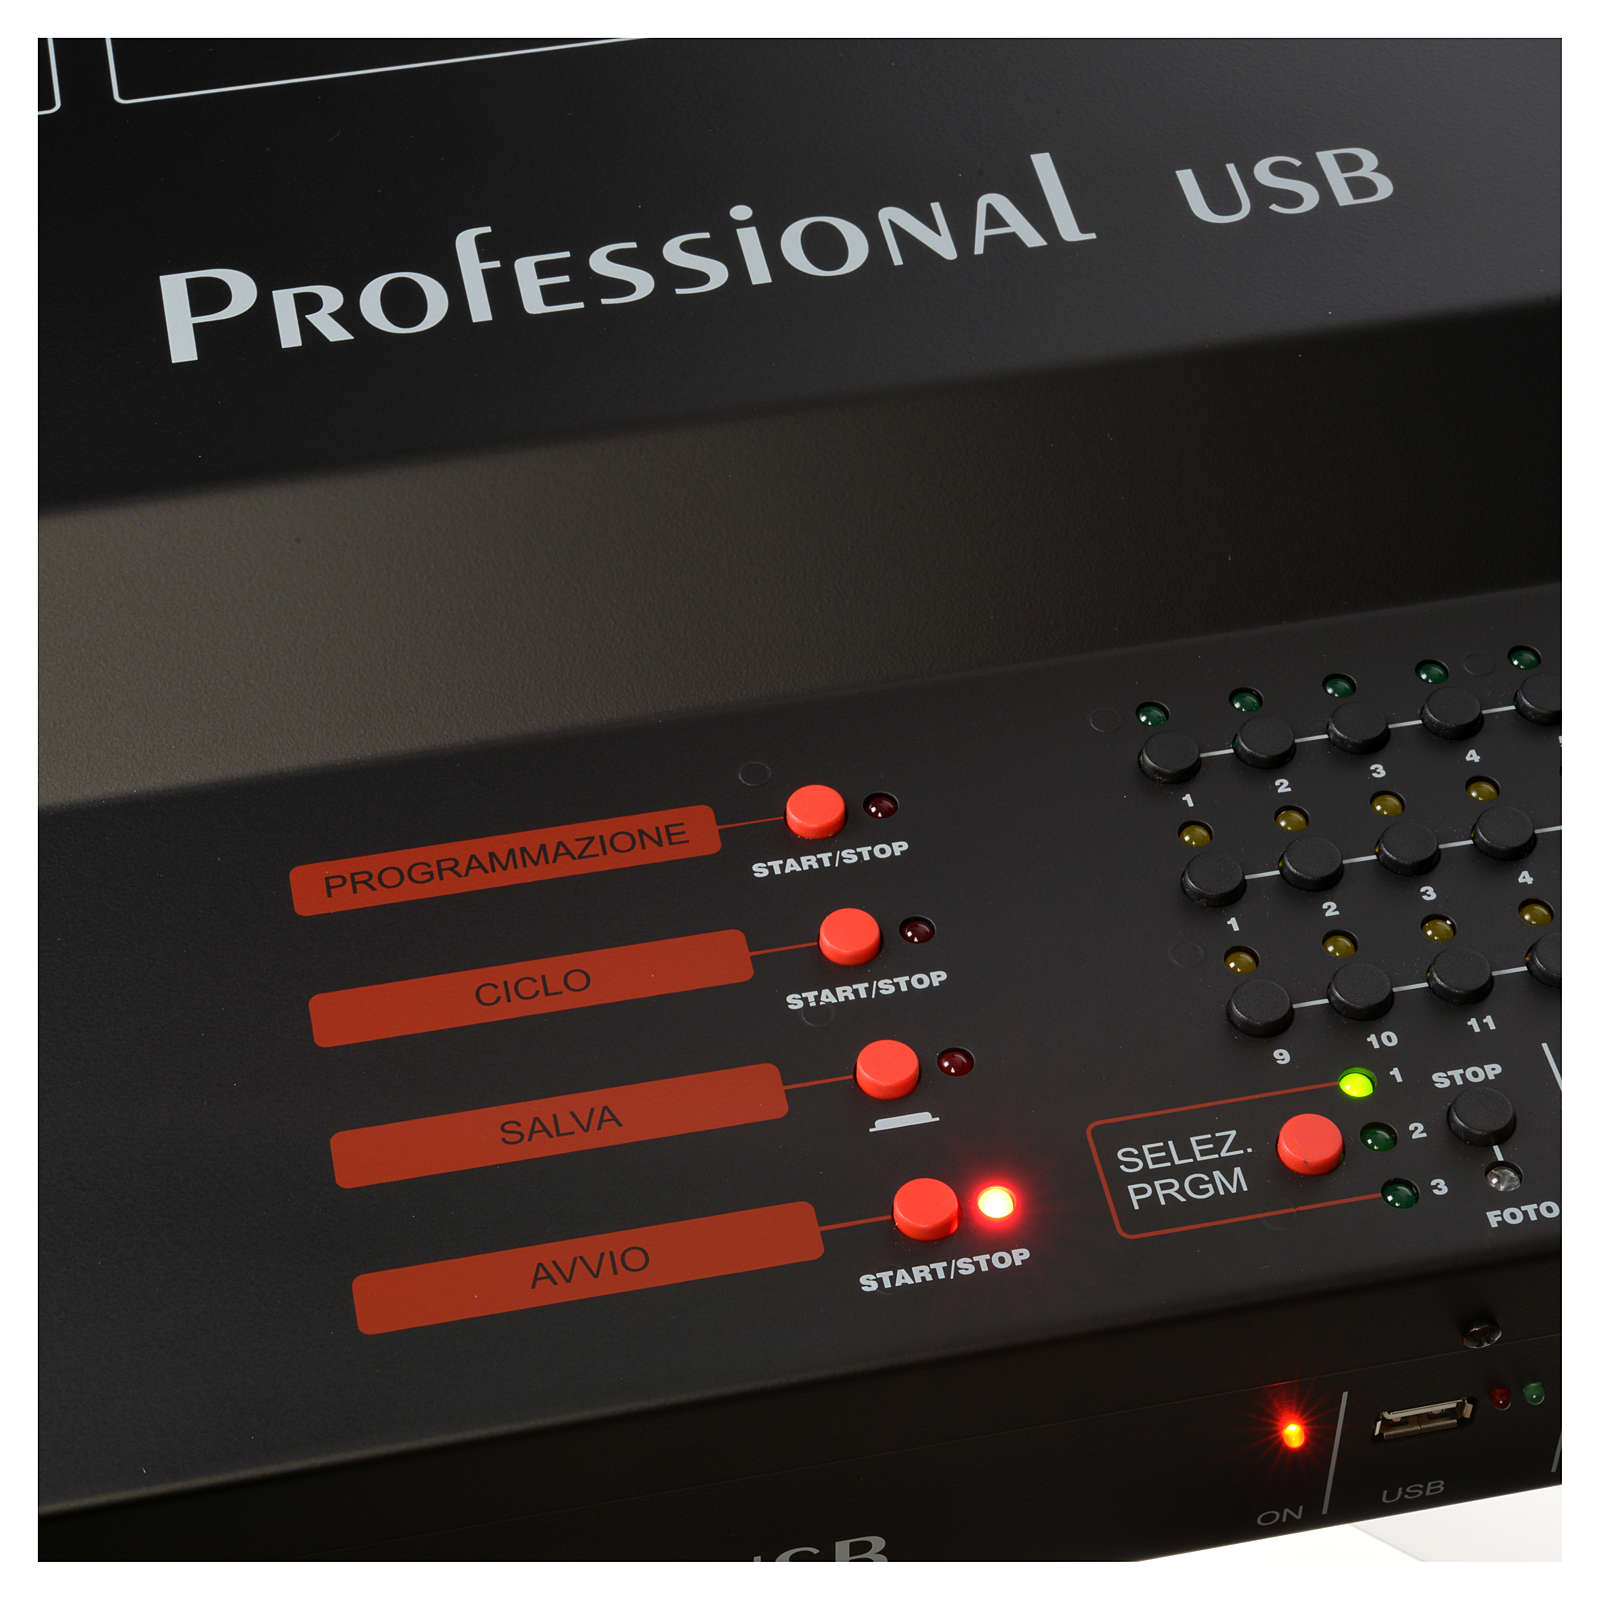 Professional USB control unit for Nativity Scene 4